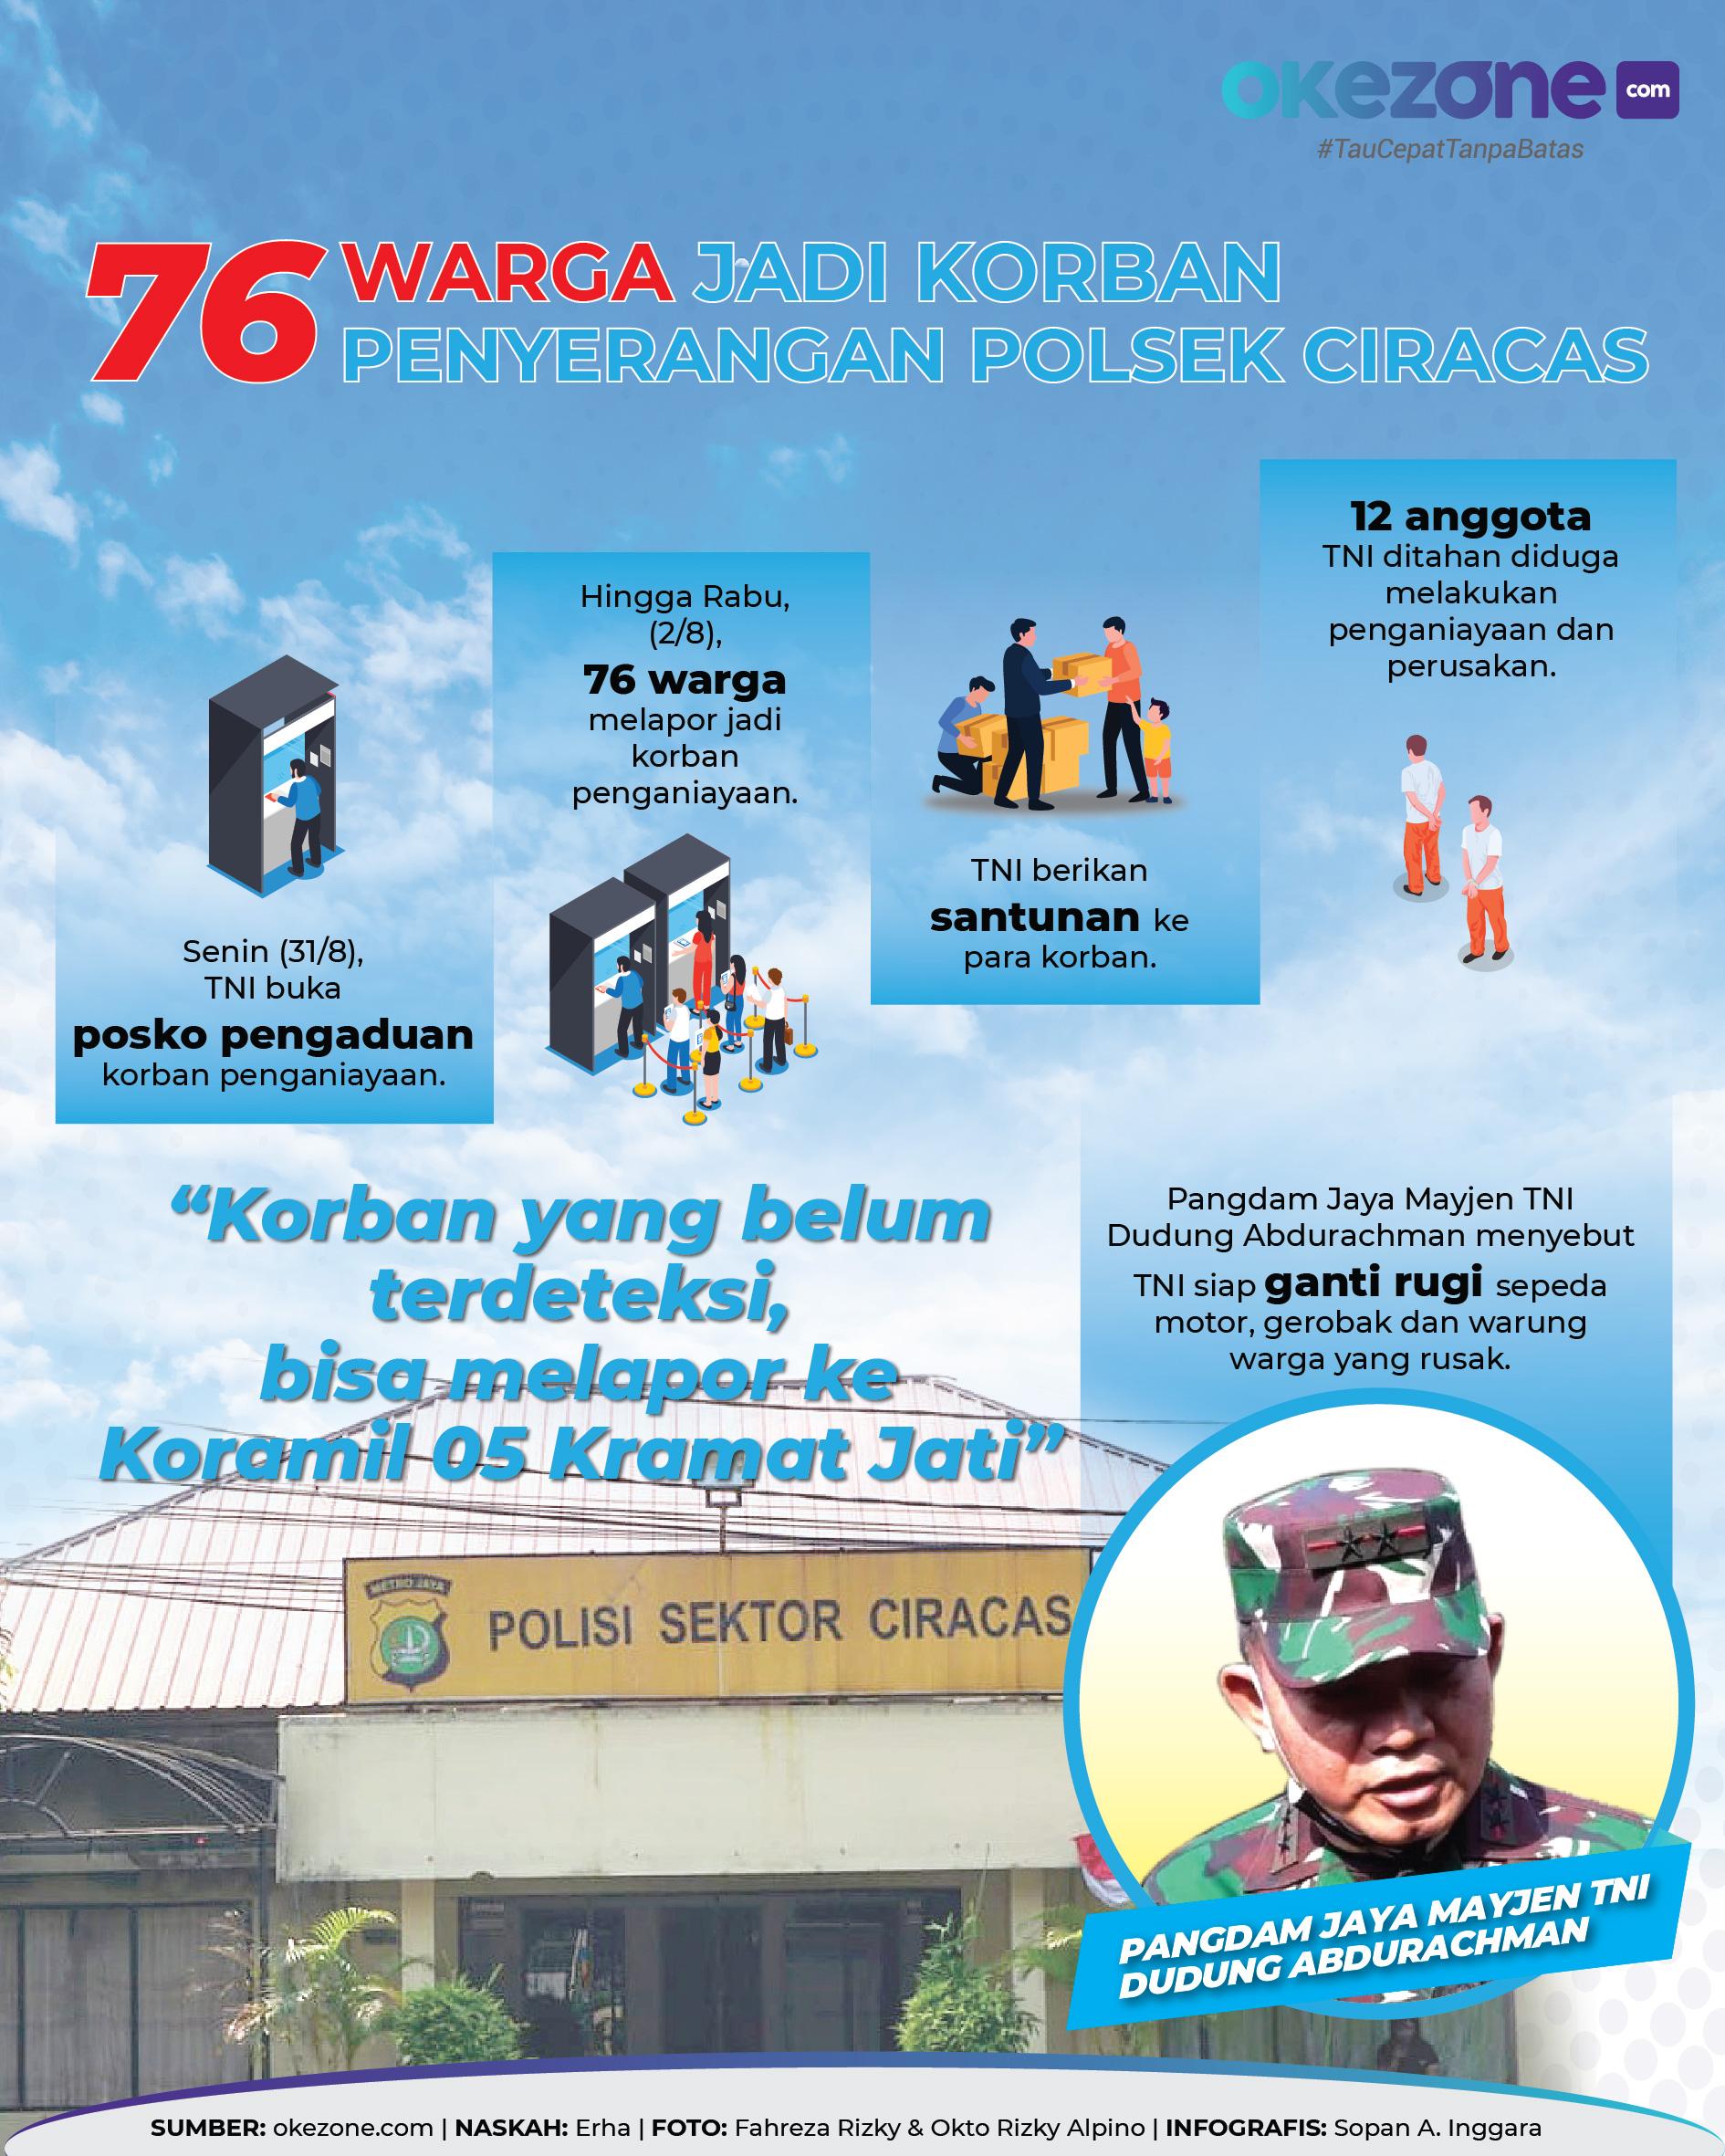 76 Warga Jadi Korban Penyerangan Polsek Ciracas -